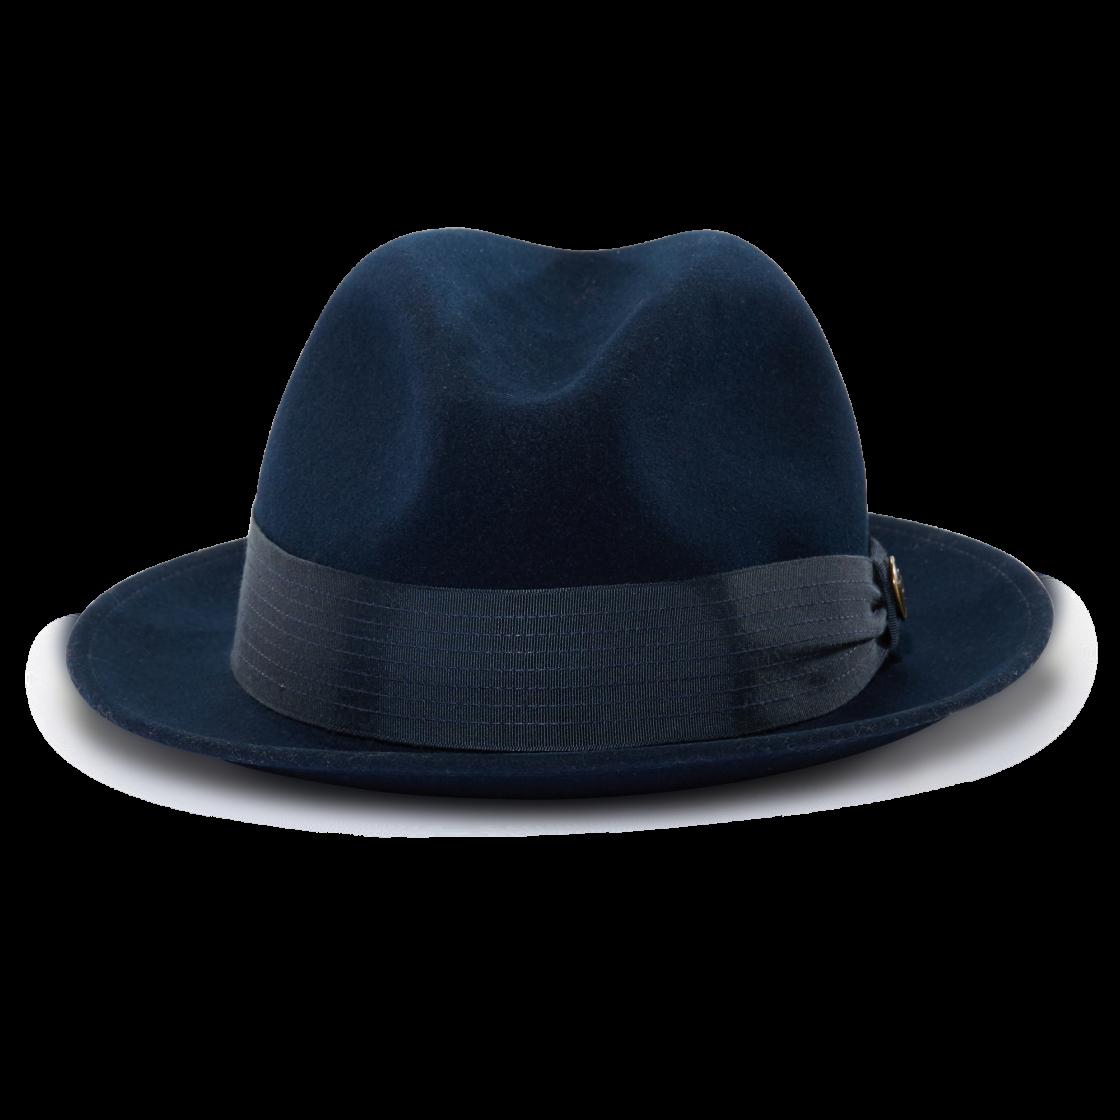 bcc8207dfdbda4 Sugar Blues | Hats | Hats, Fedora fashion, Dress hats